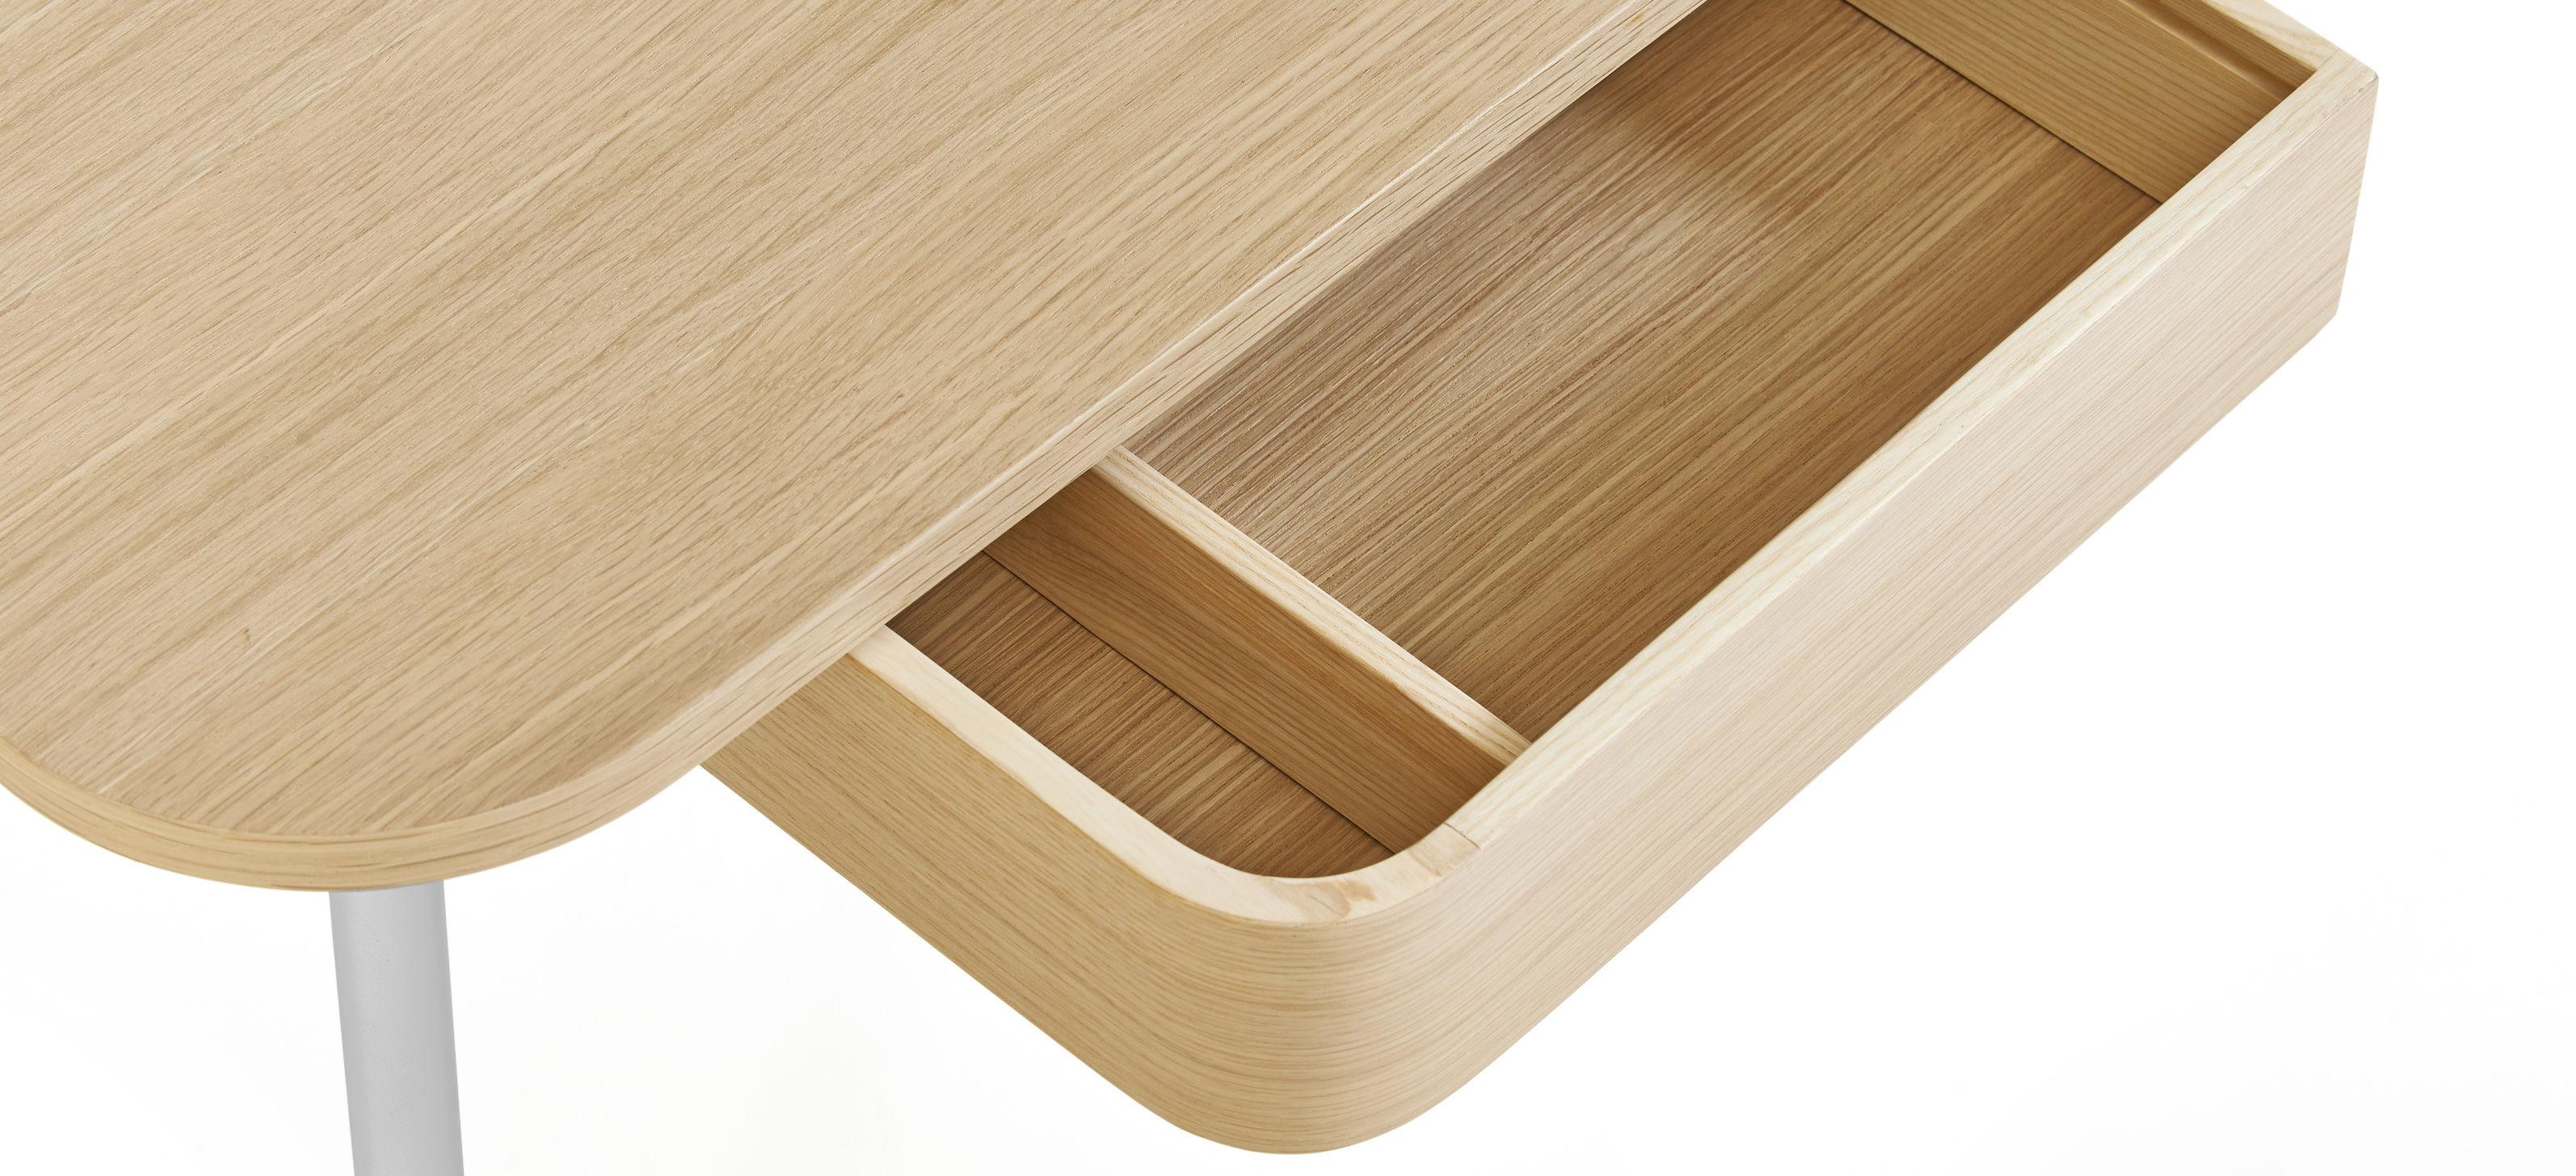 victor schreibtisch hellgrau holz natur by hart made in design. Black Bedroom Furniture Sets. Home Design Ideas